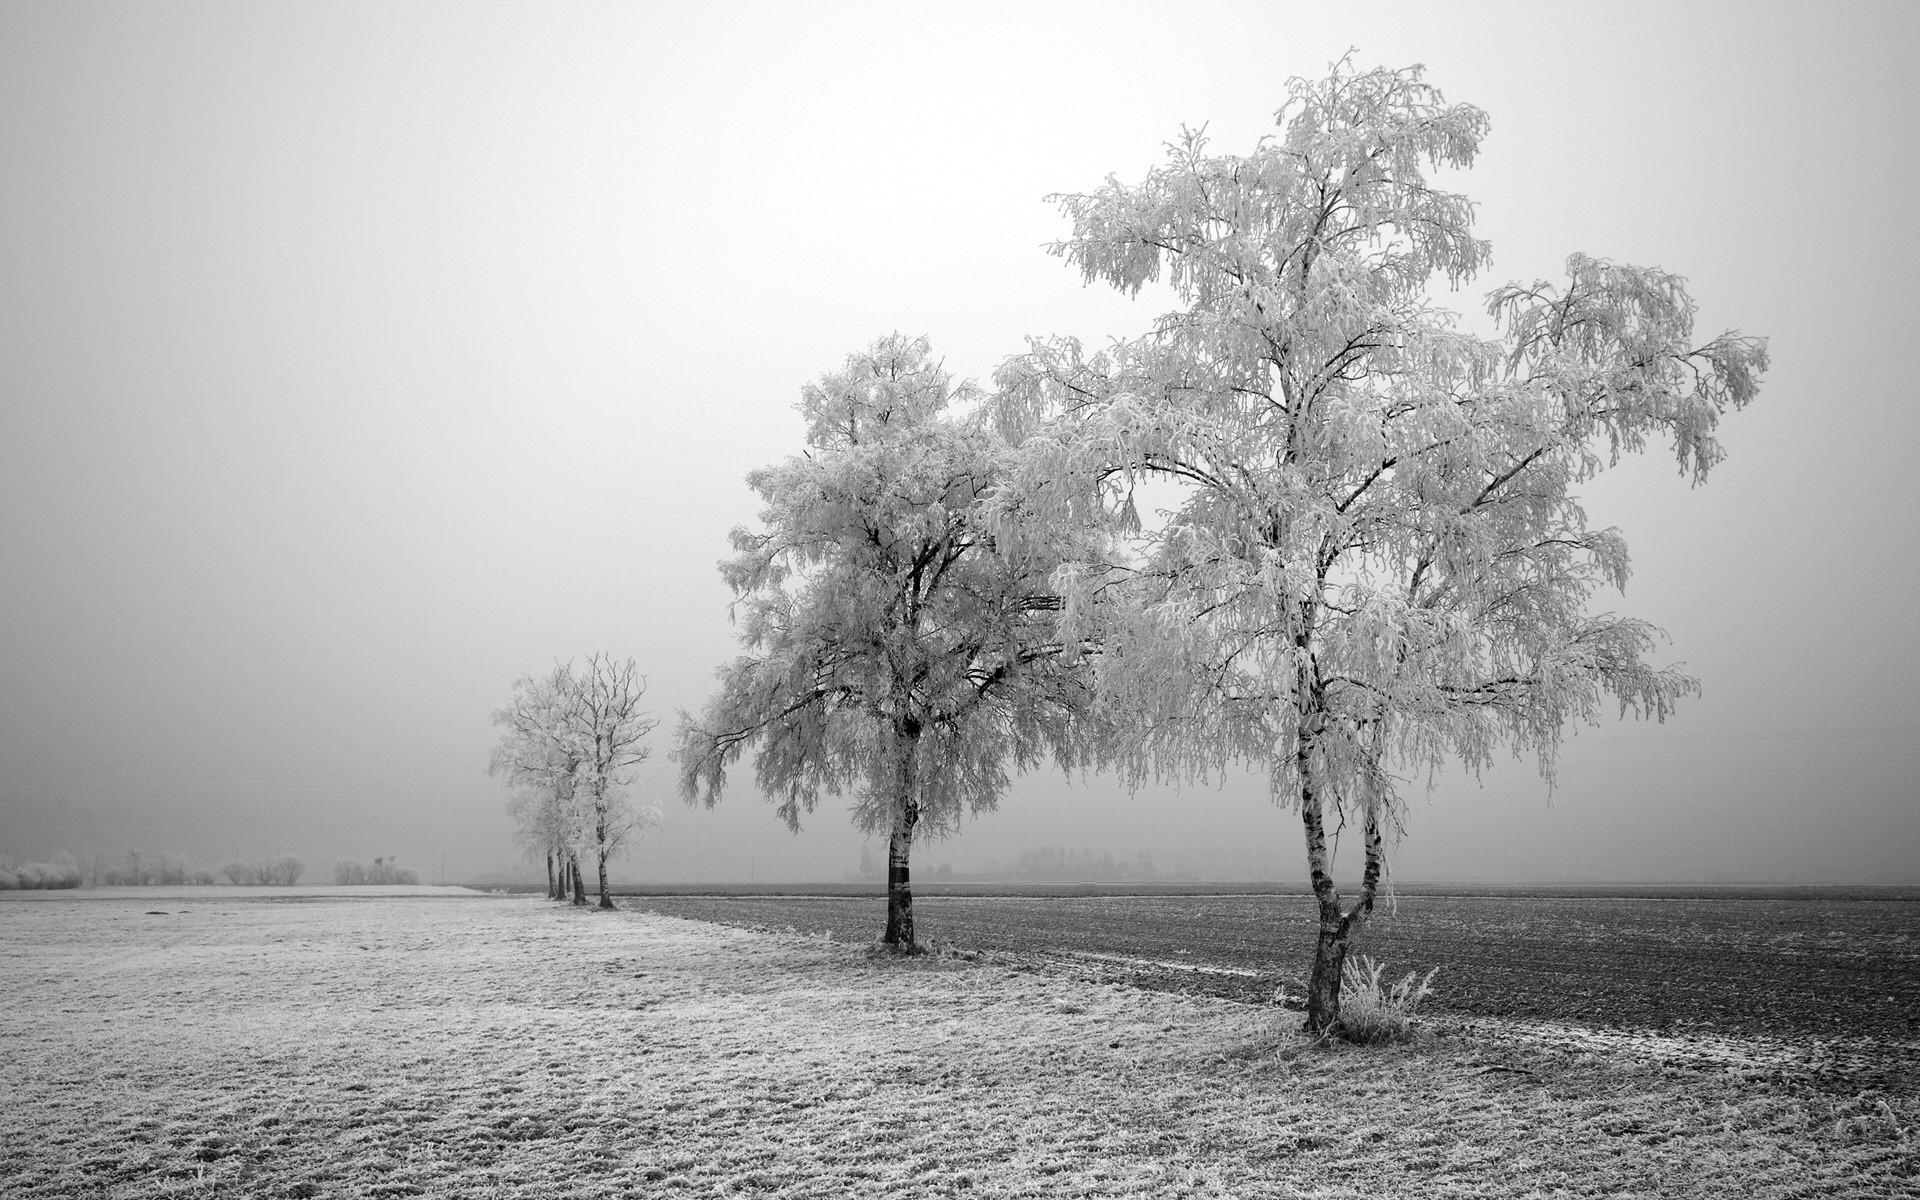 Frozen field and trees – winter wallpaper